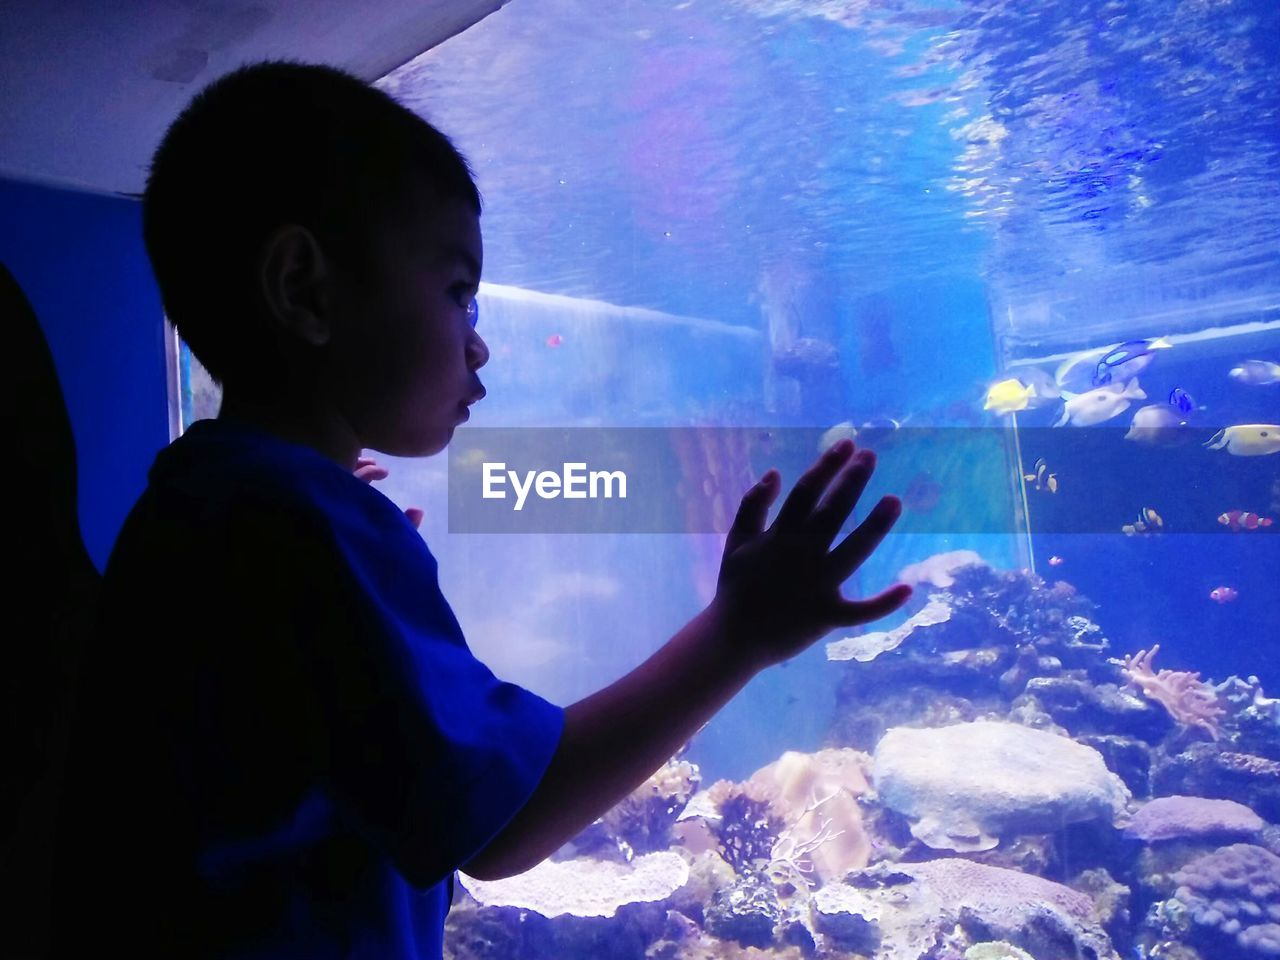 Boy swimming in fish tank at aquarium